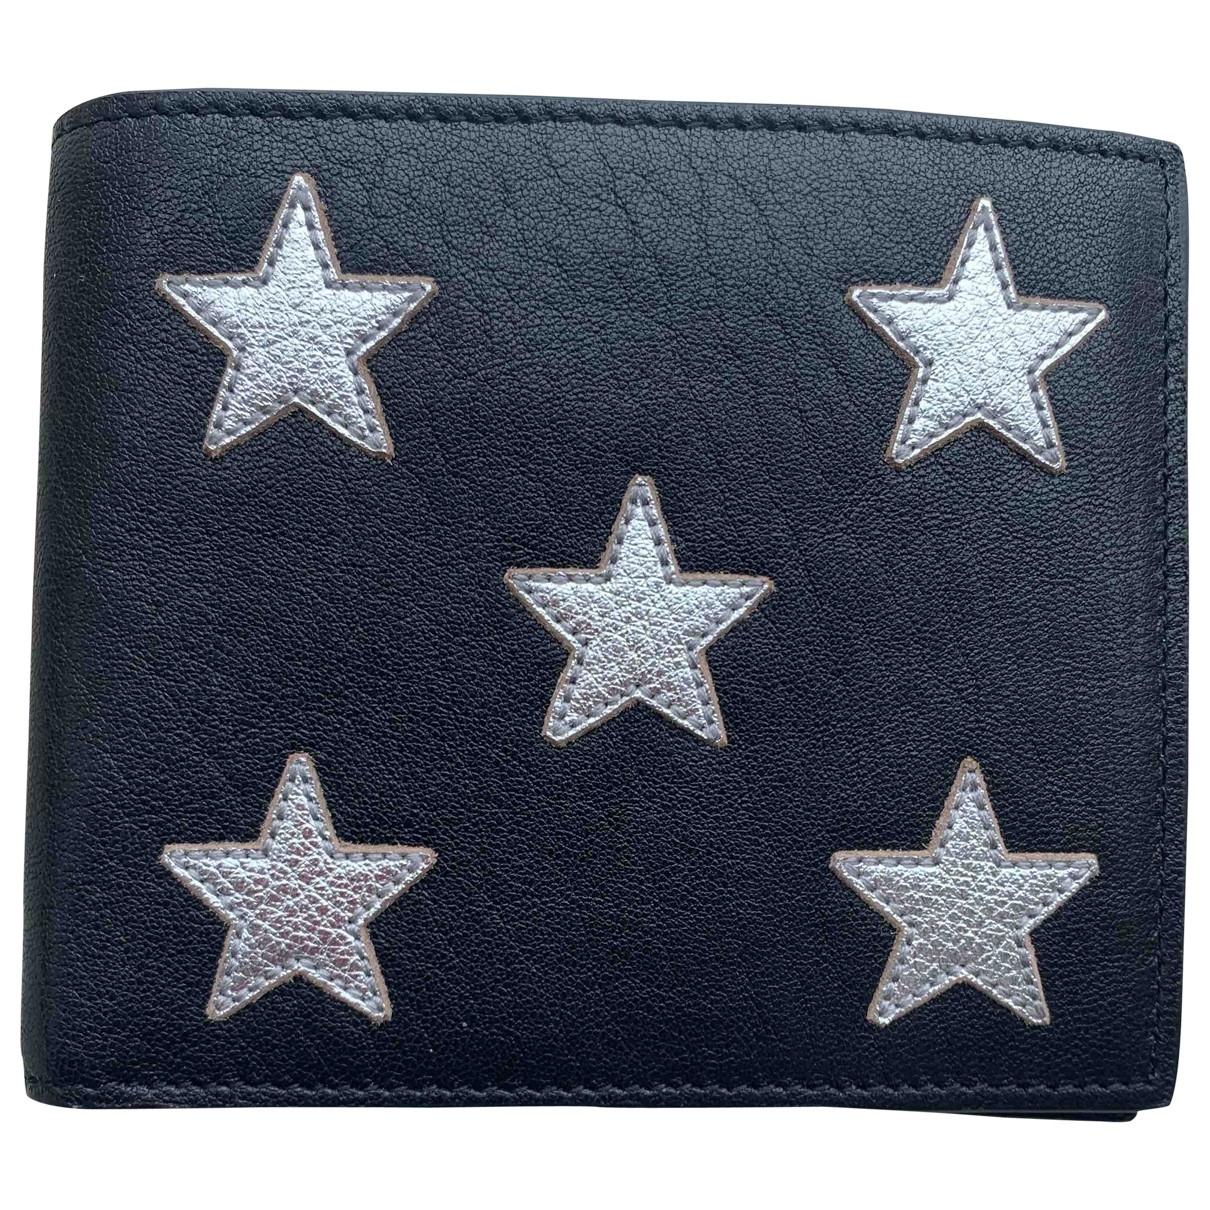 Saint Laurent \N Black Leather wallet for Women \N